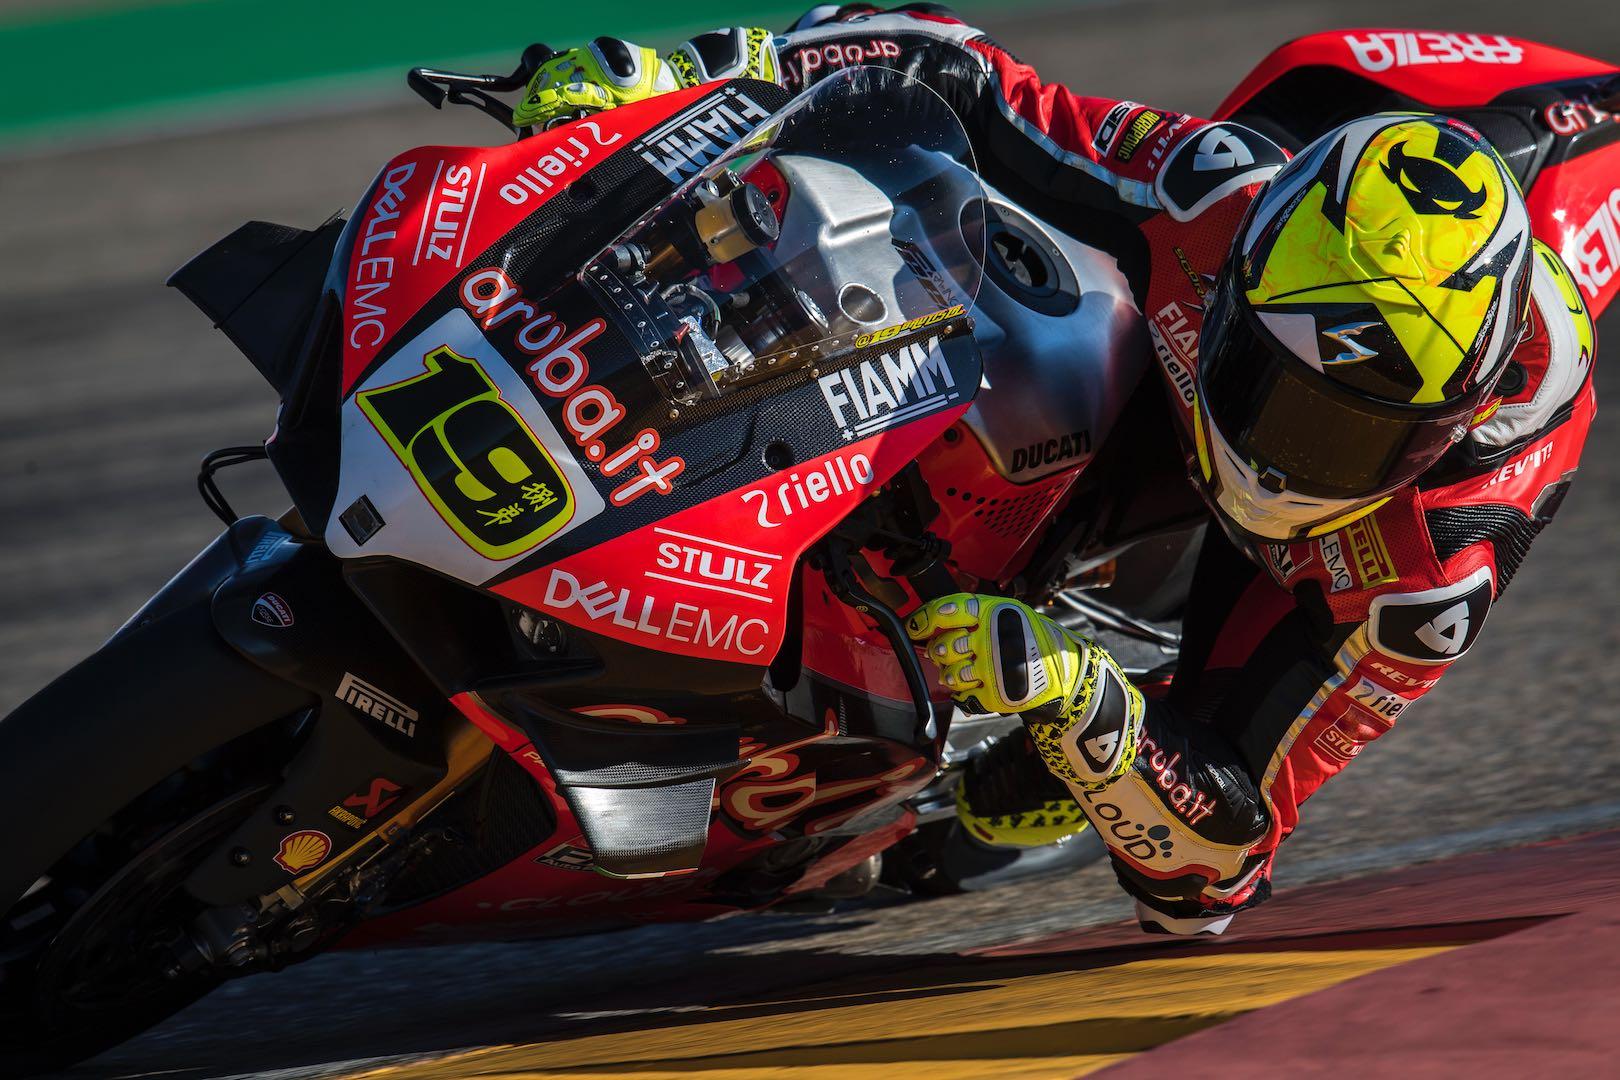 2019 Aragon WorldSBK: Bautista & Ducati